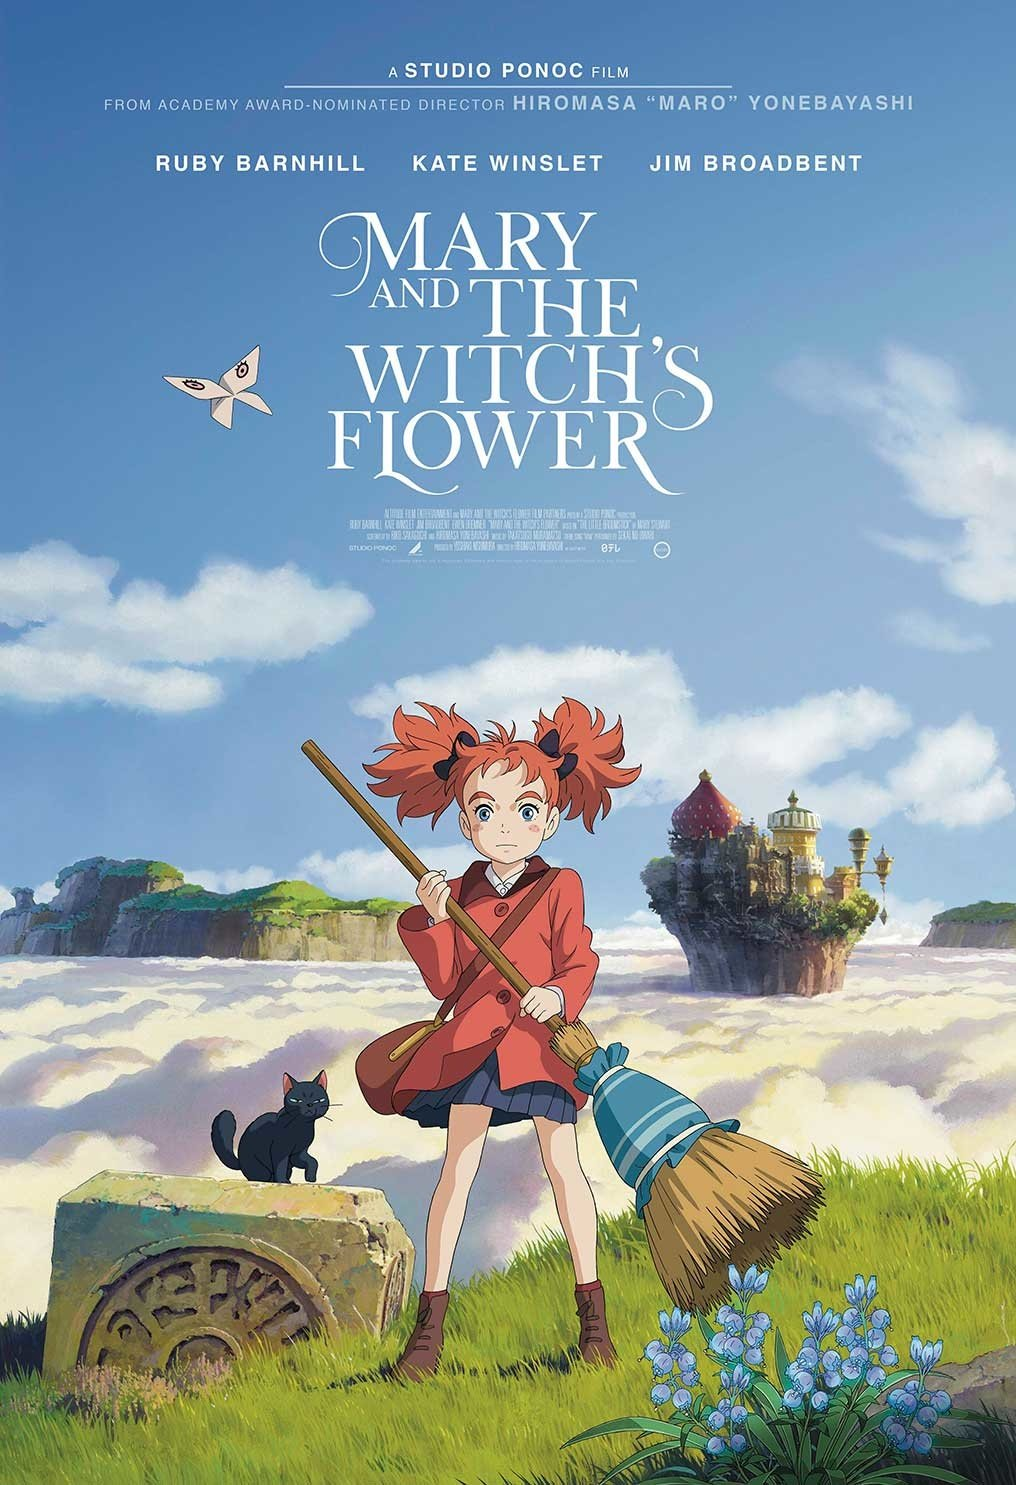 Xem Phim Mary và Đoá Hoa Phù Thuỷ - Mary And The Witch's Flower